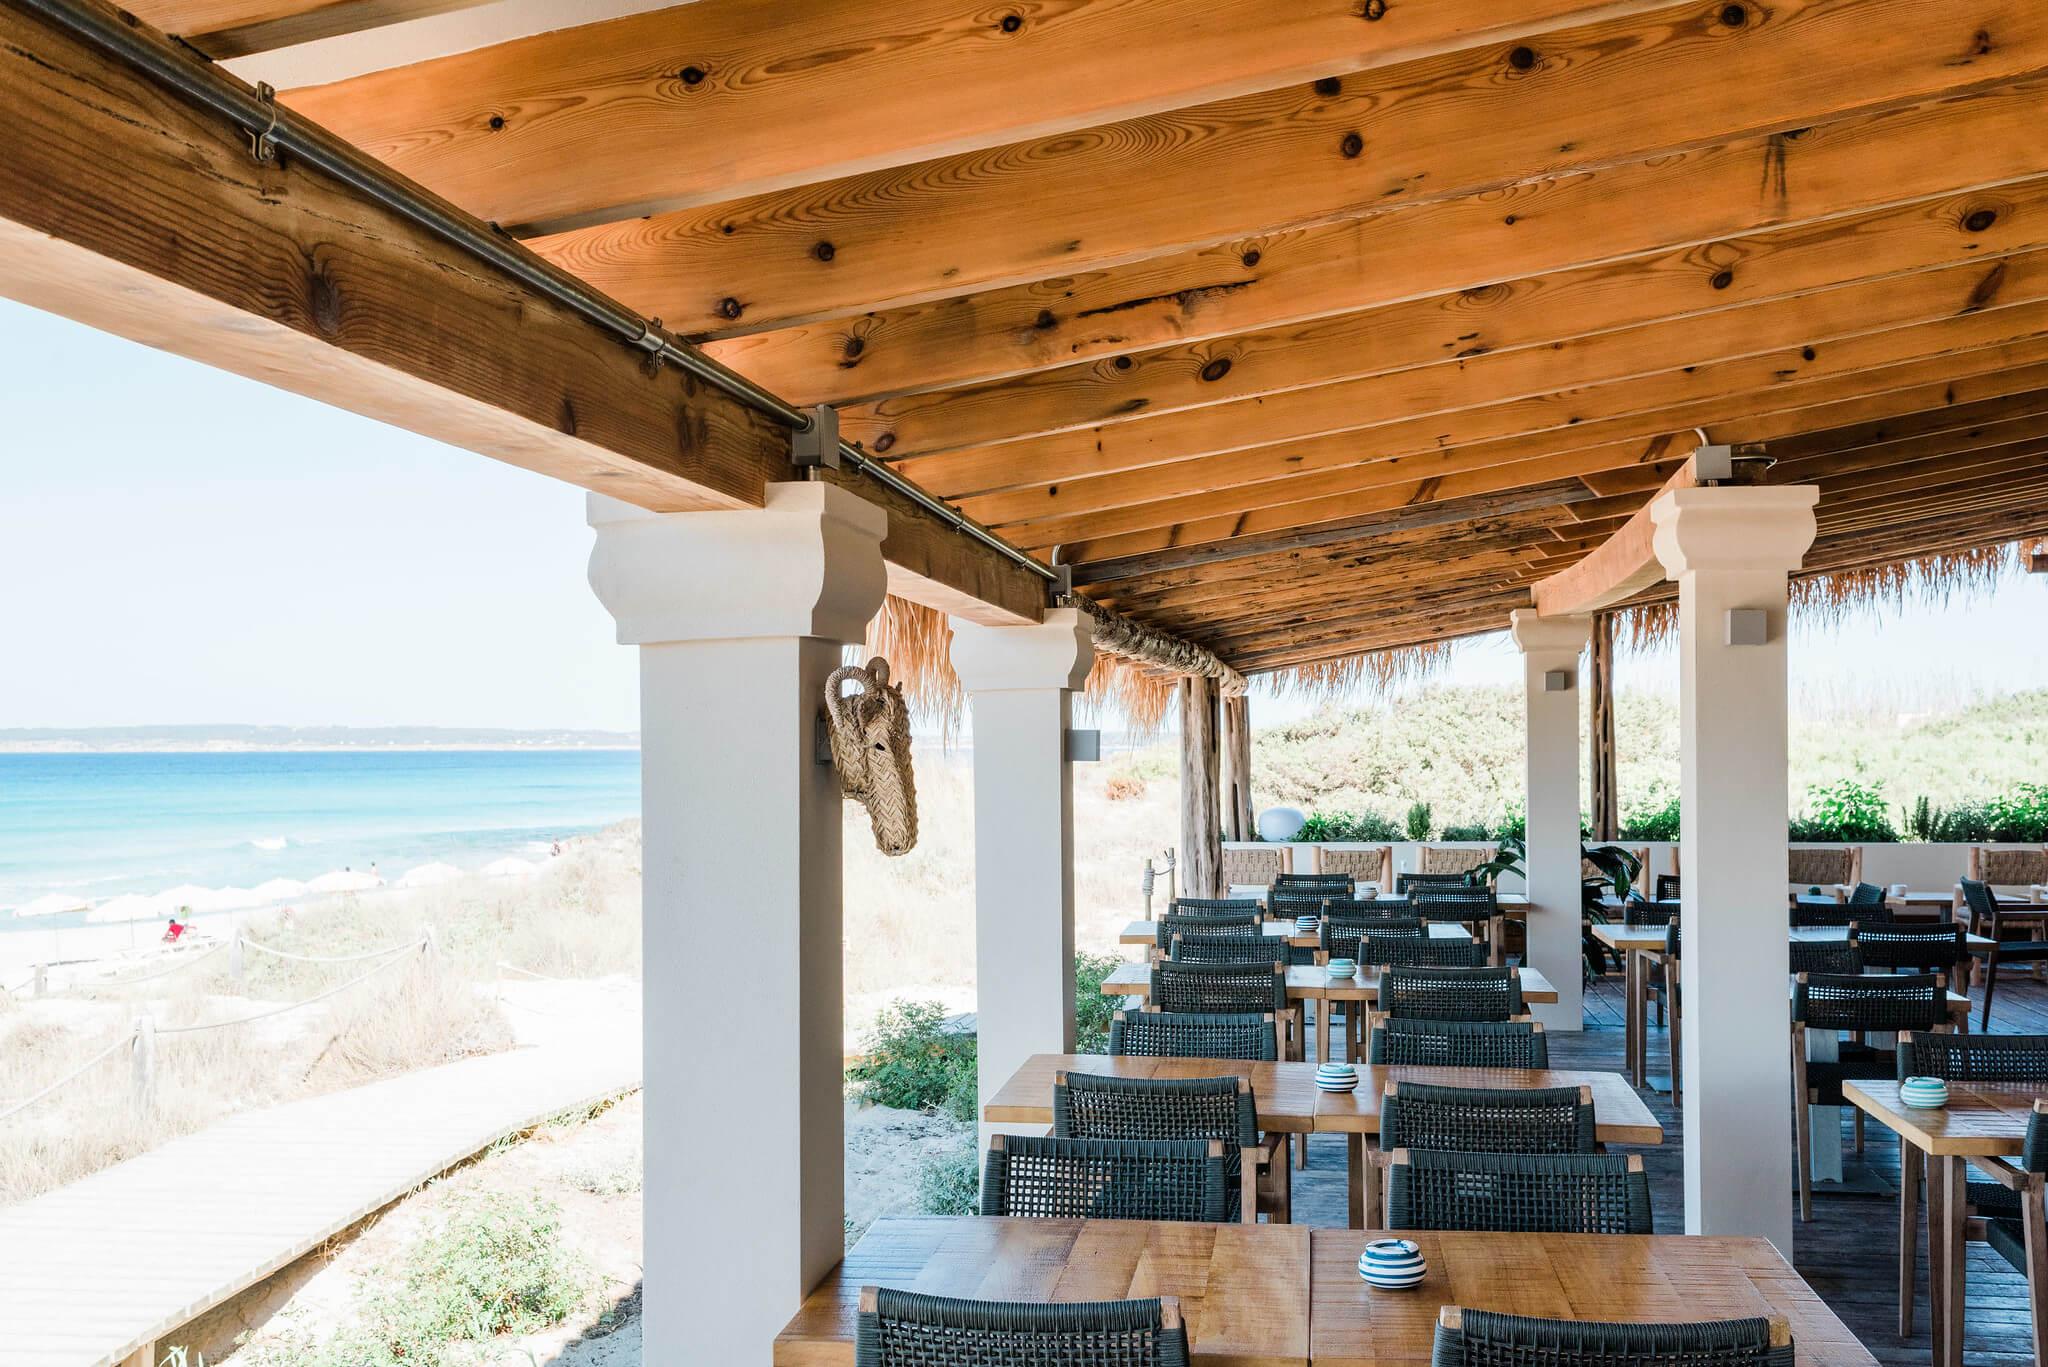 https://www.white-ibiza.com/wp-content/uploads/2020/03/formentera-beach-restaurants-flipper-2020-06.jpg